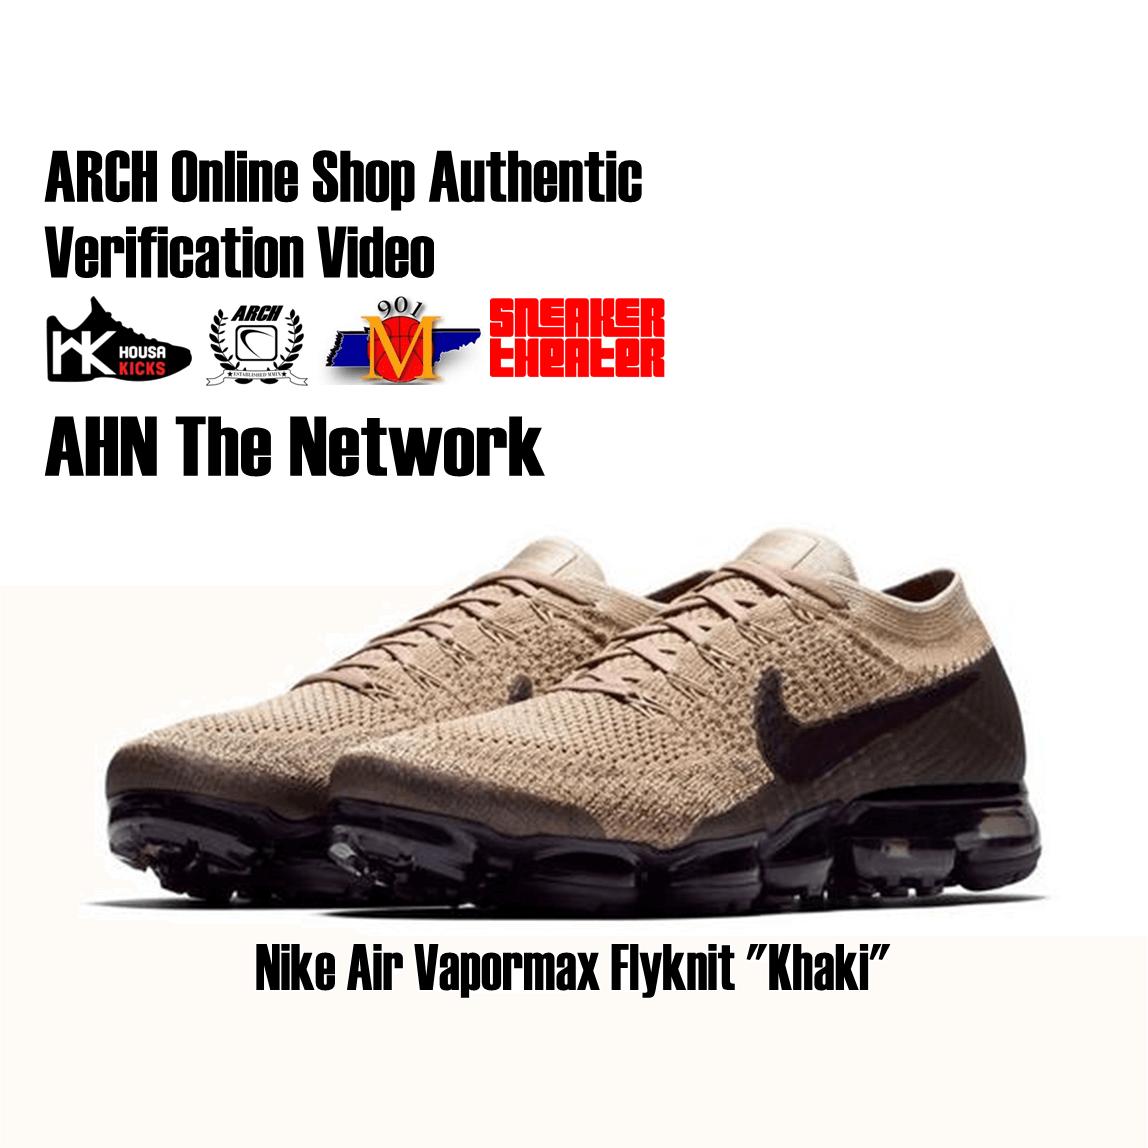 premium selection 58c28 7b35f Nike Vapormax Flyknit 'Khaki' | Authentic Verification ...